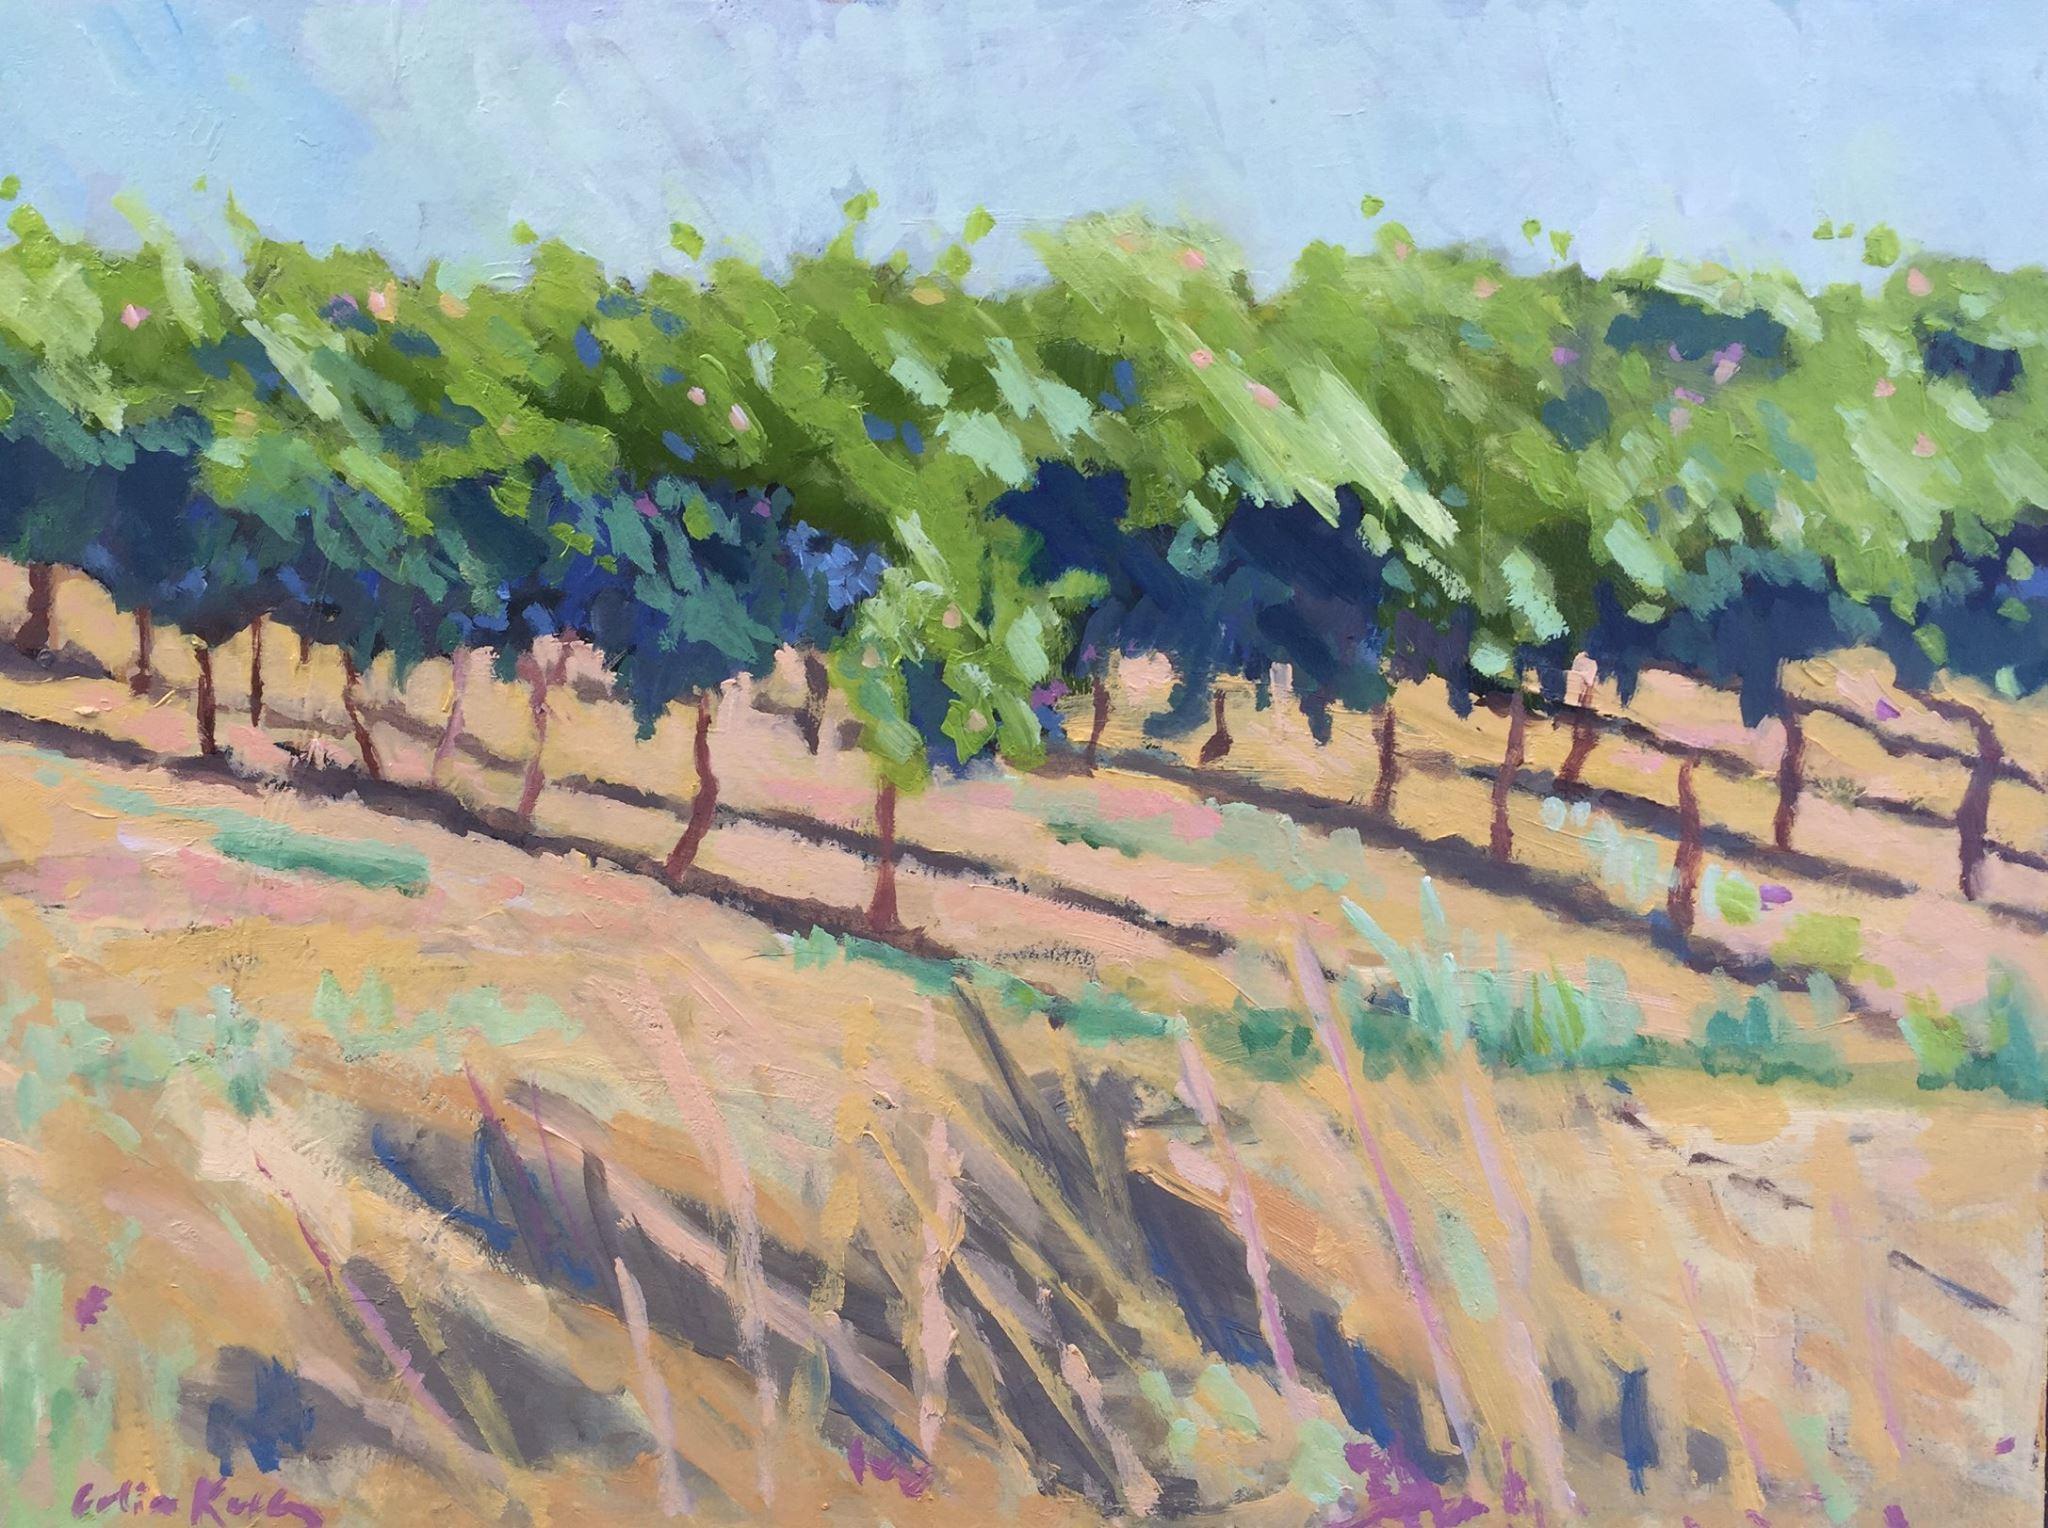 """Sunswept"" Celia Kelly,oil on panel,11x14in,2017, NFS"